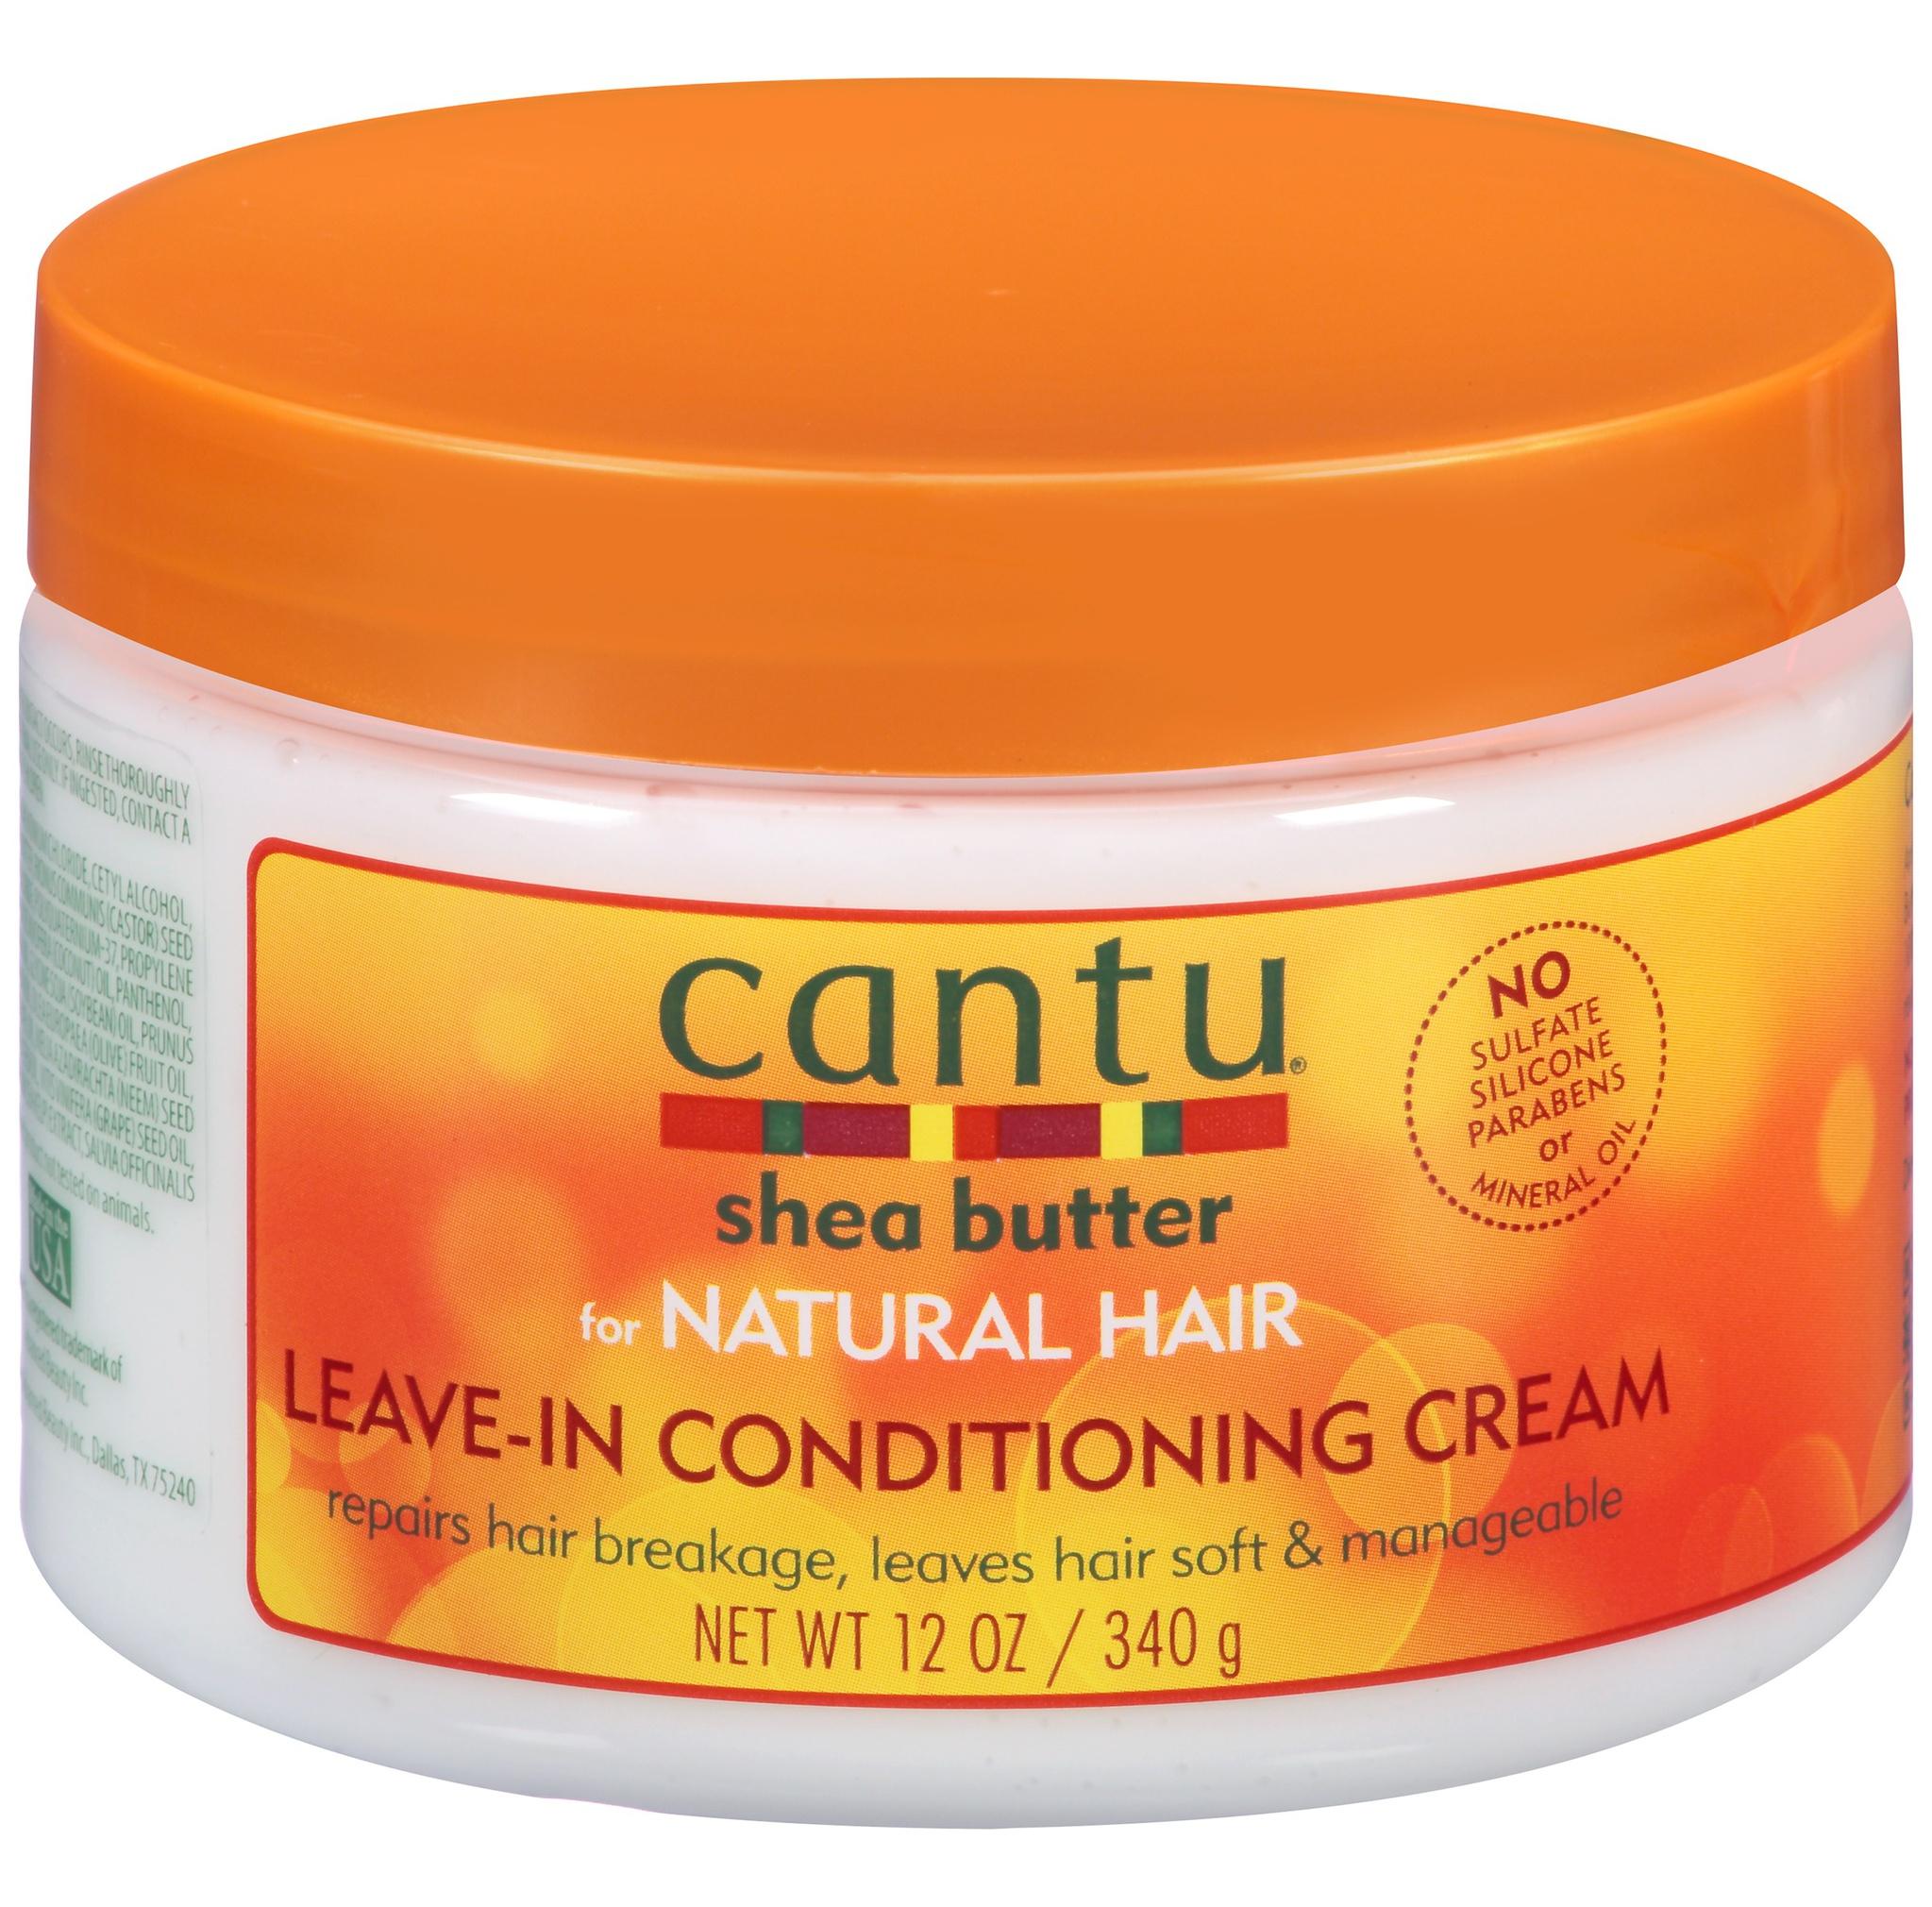 Cantu Natural Leave In Conditioning Cream